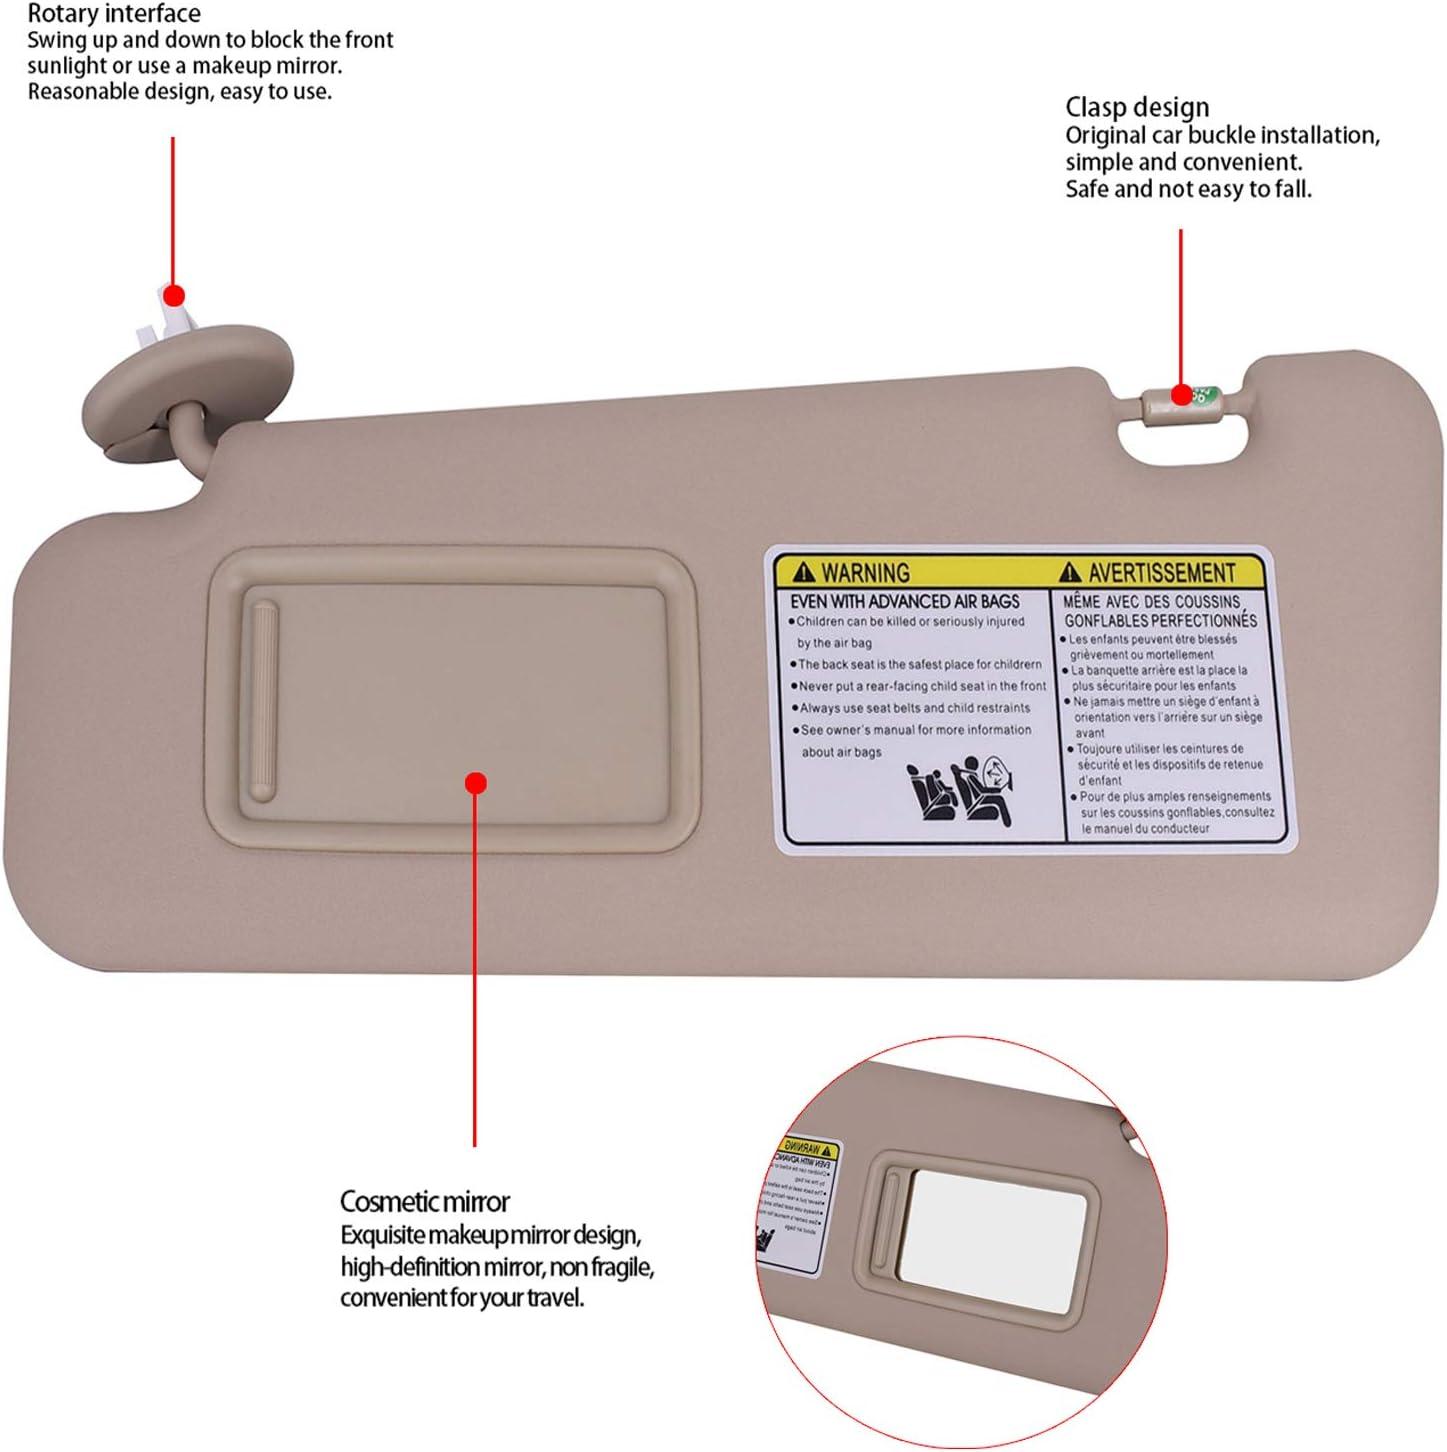 CULMKARI Left Driver Side Sun Visor for Toyota Highlander 2008-2013 with Vanity Light Replaces 74320-48500-B0 Beige